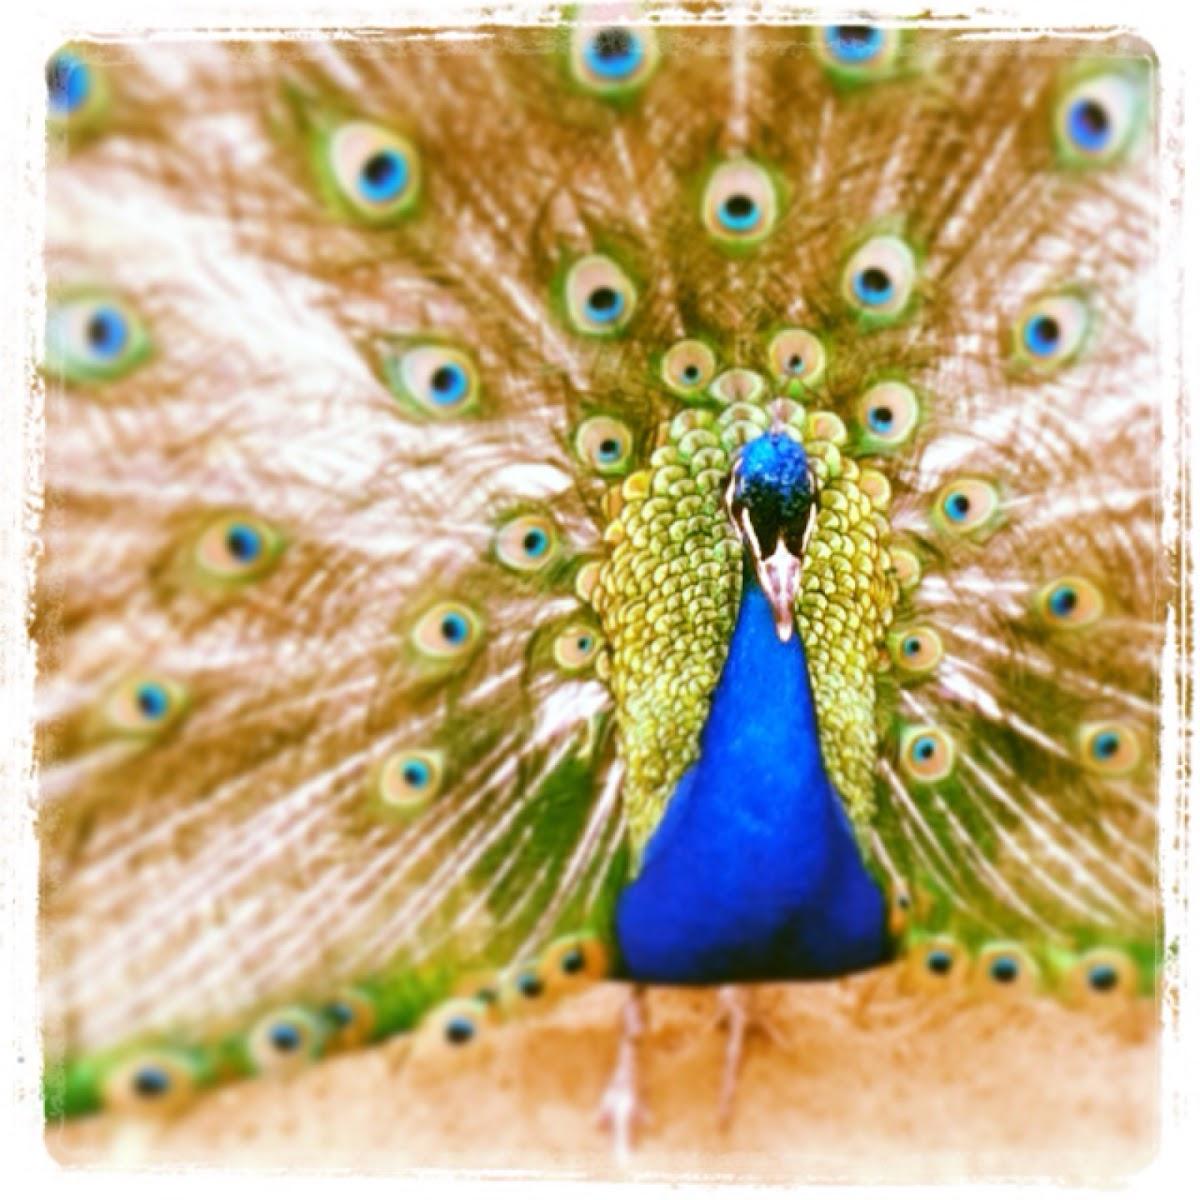 Peacock(male)